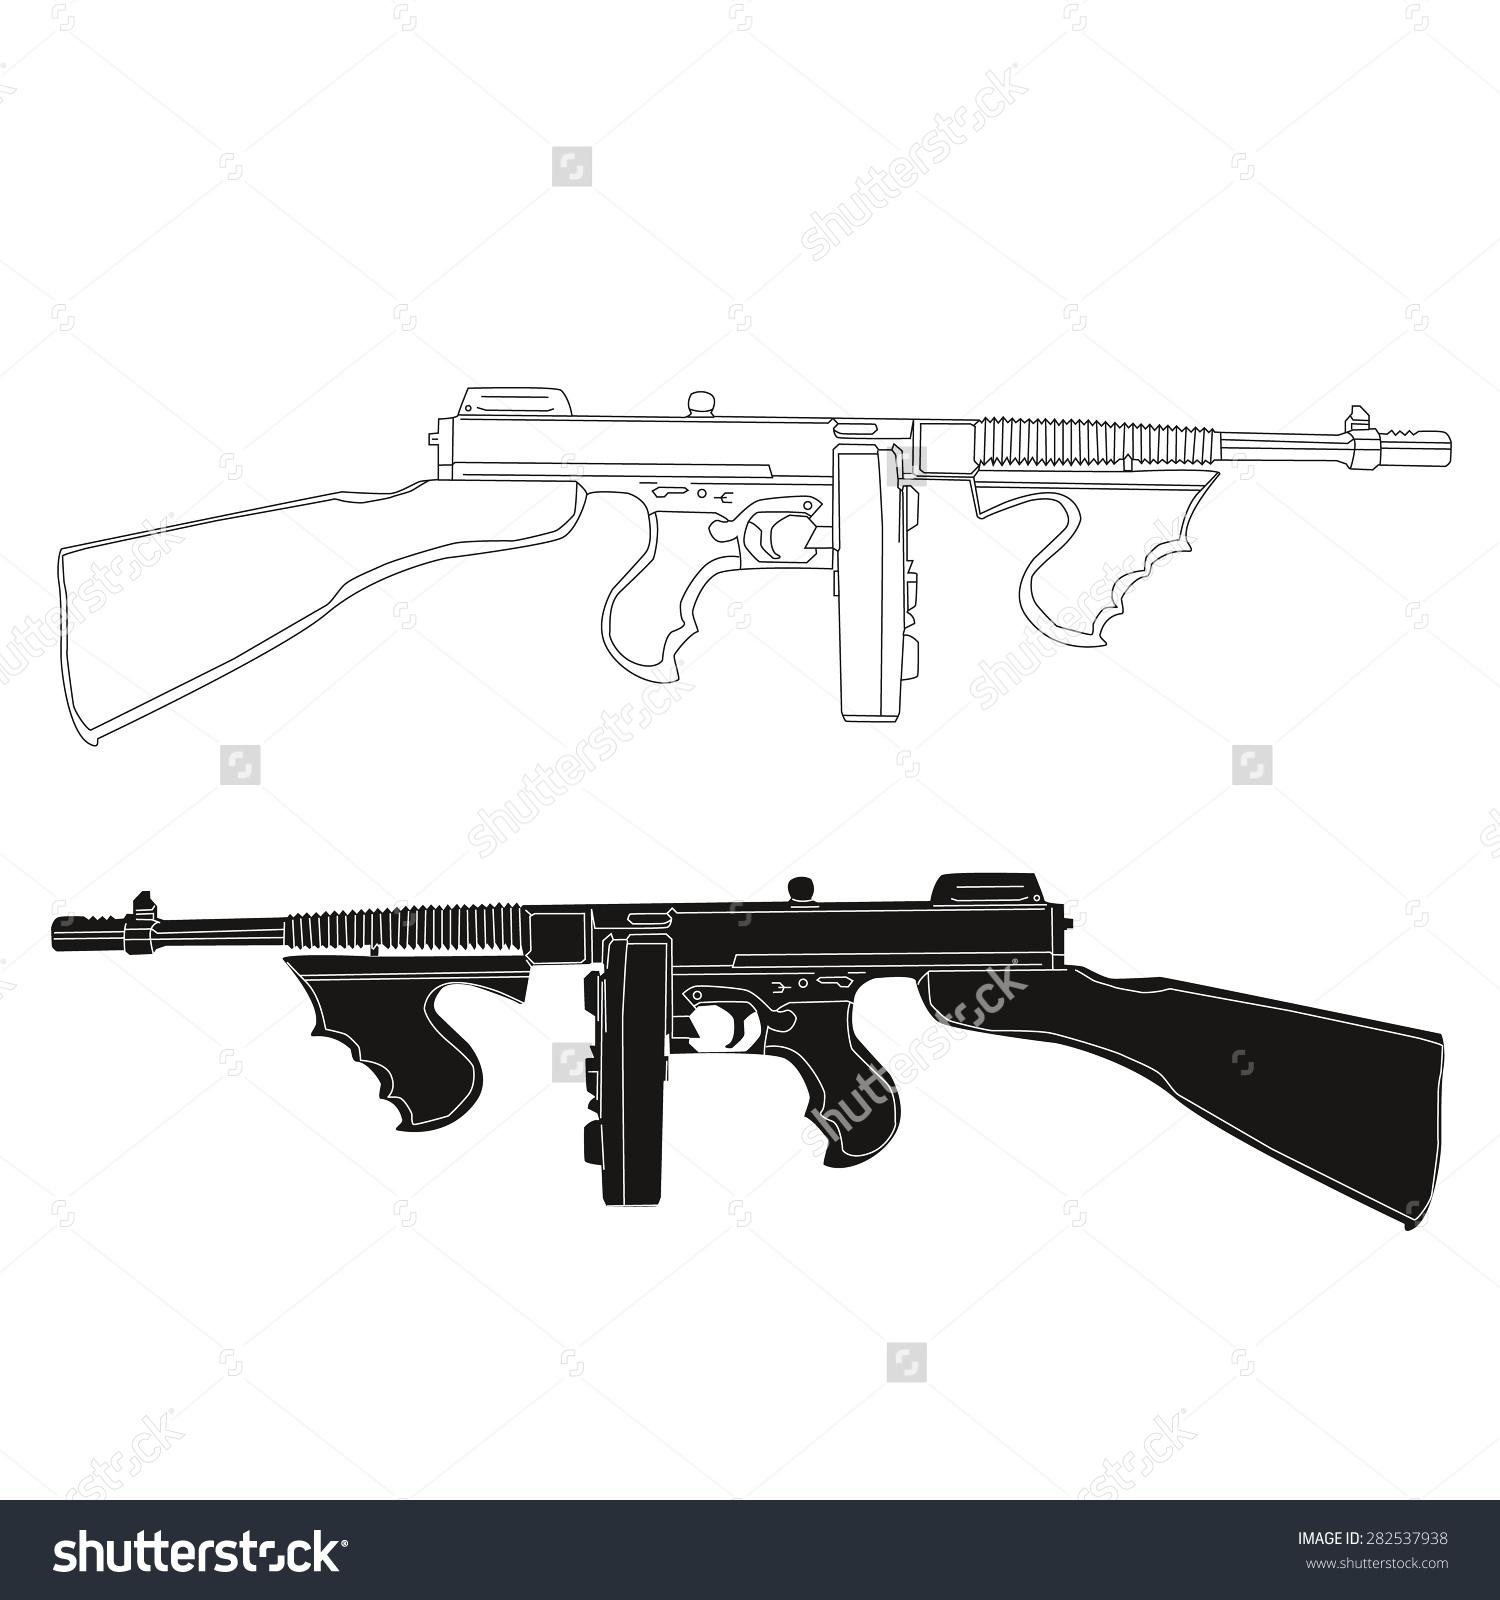 Tommy gun clipart.